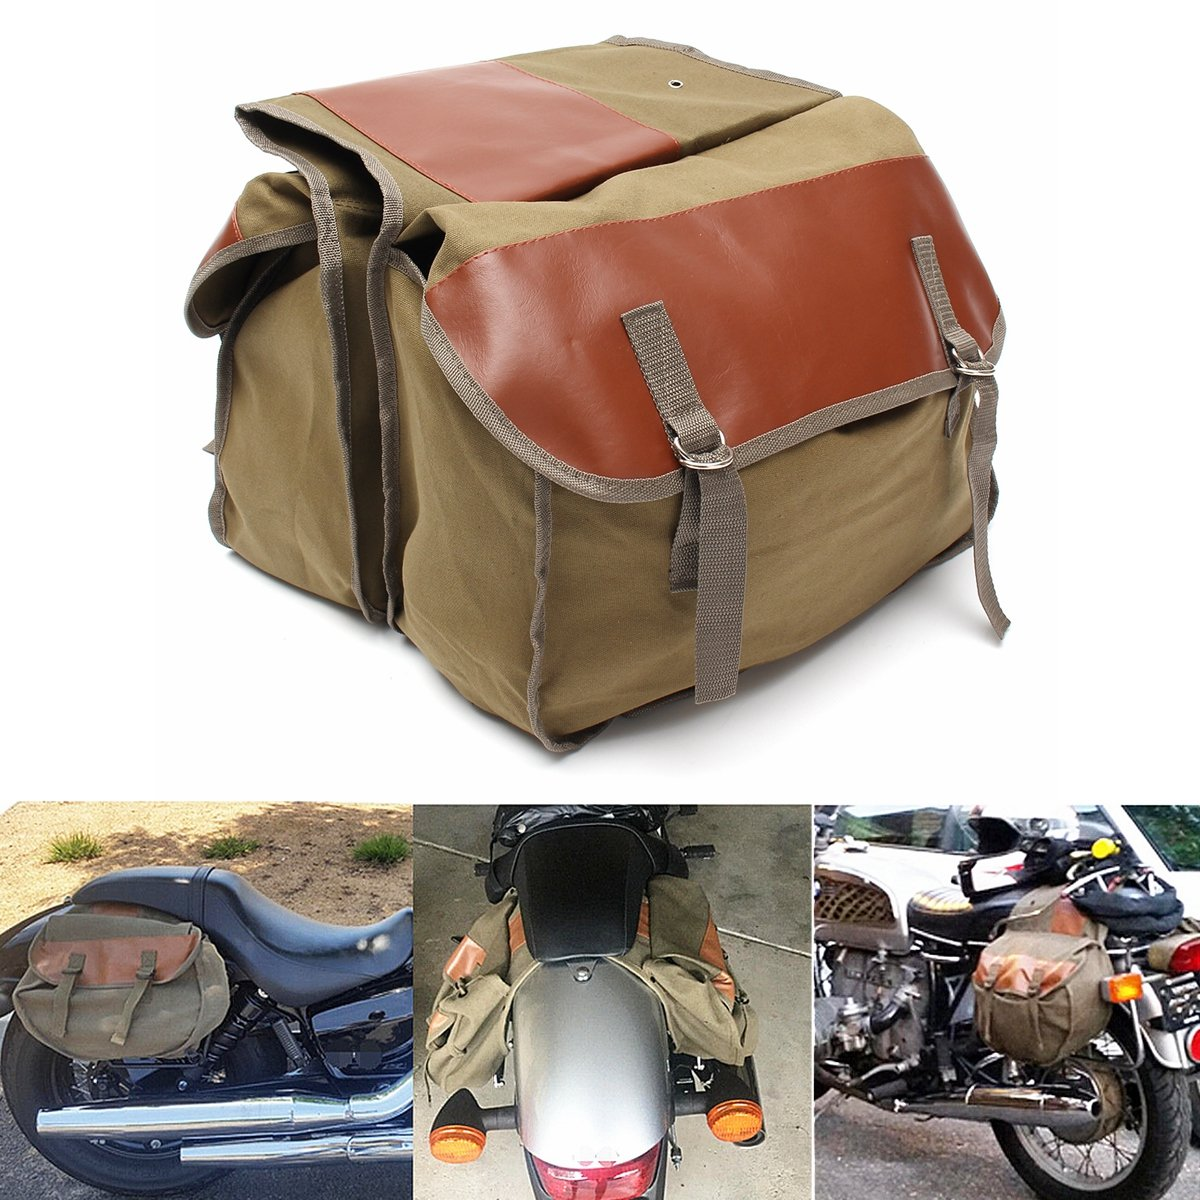 GOZAR Moto Toile Sacoches Sac À Dos Équin pour Haley Sportster/Honda